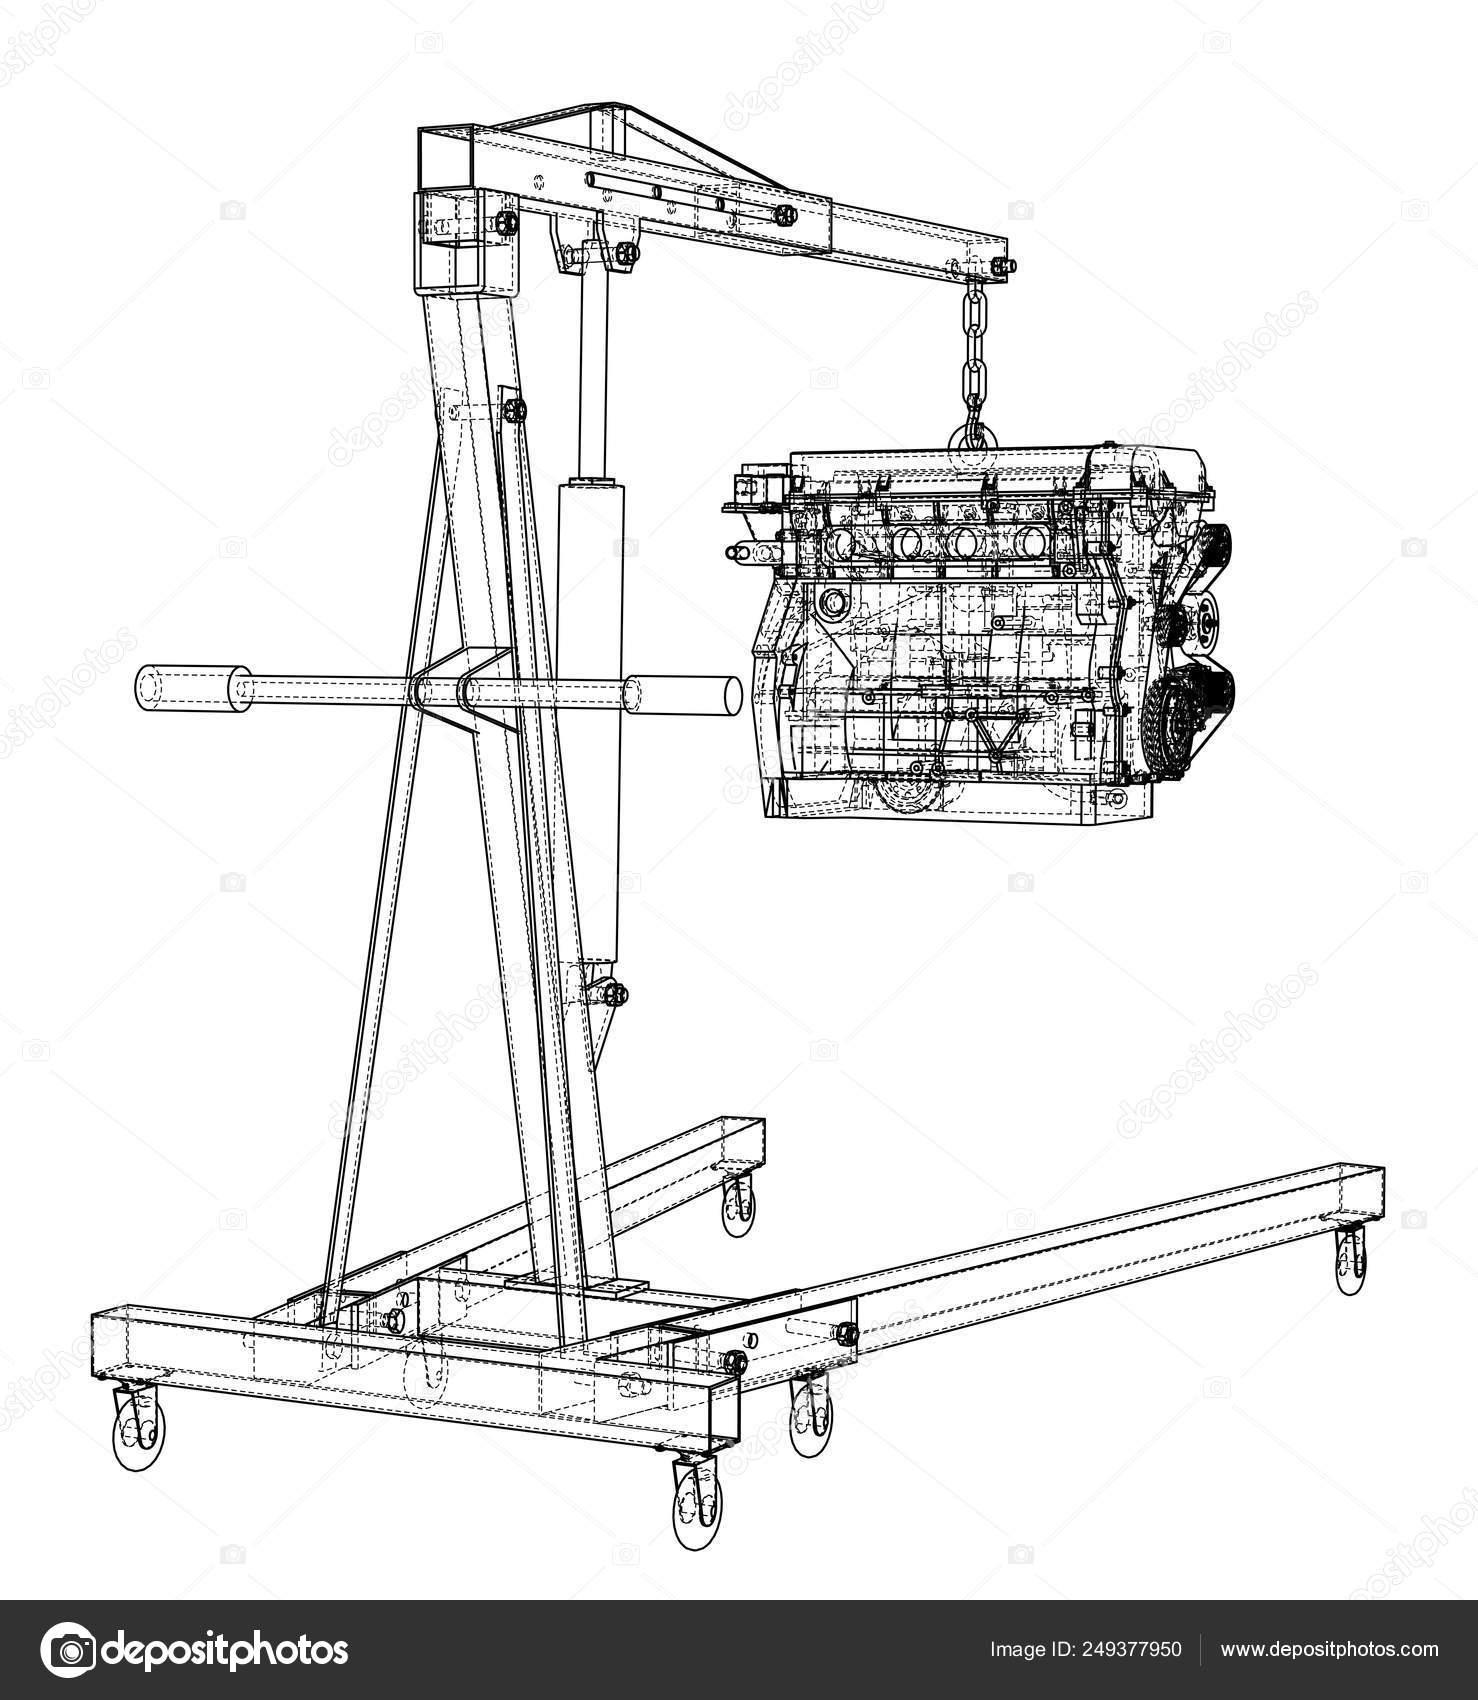 Engine hoist with engine outline — Stock Vector © cherezoff #249377950Depositphotos